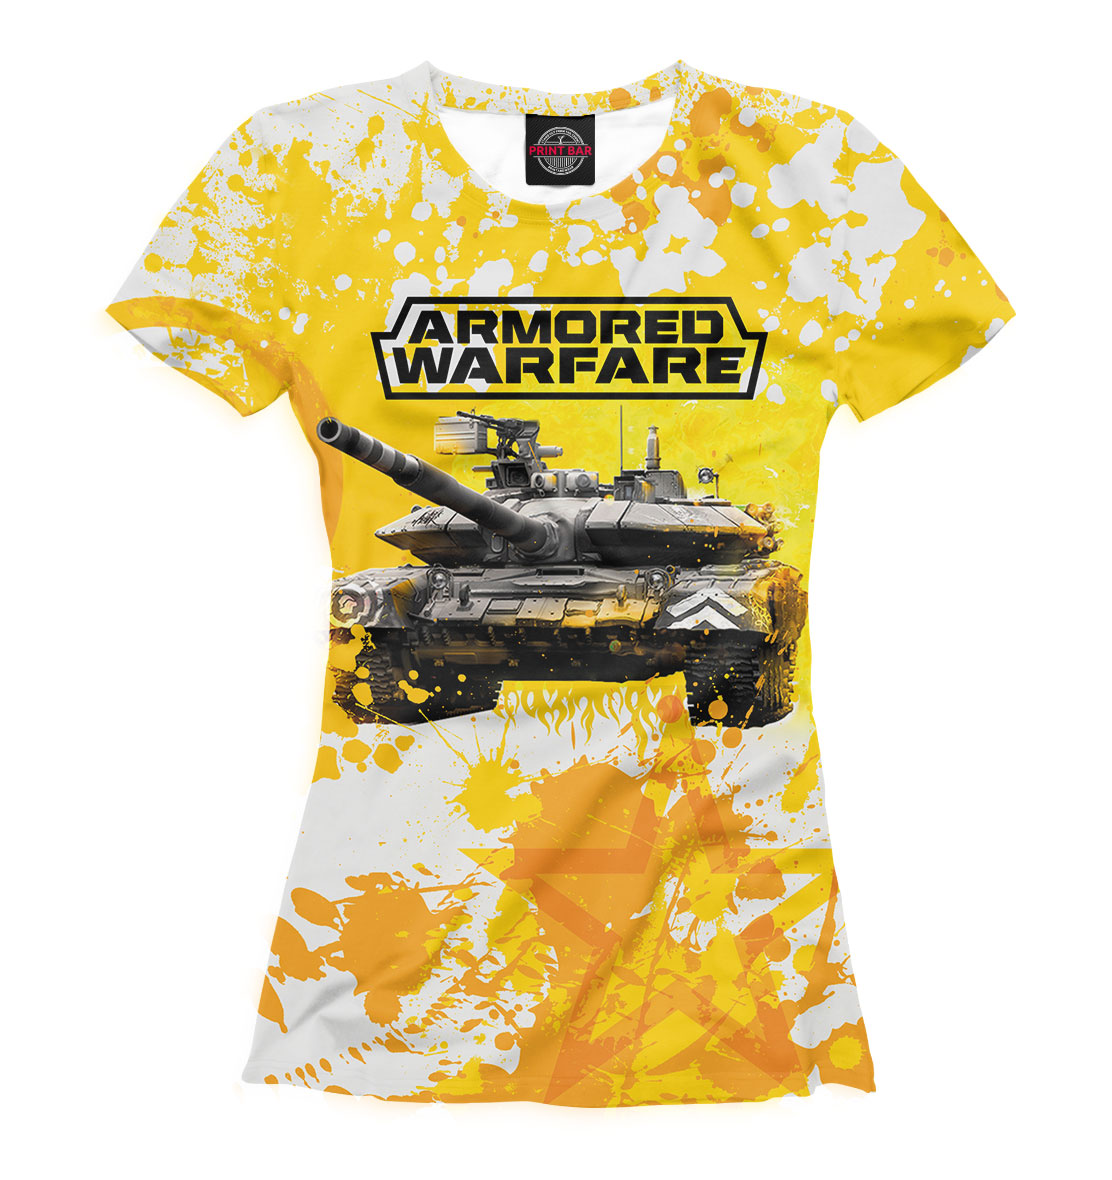 Купить Armored Warfare, Printbar, Футболки, ARW-821363-fut-1